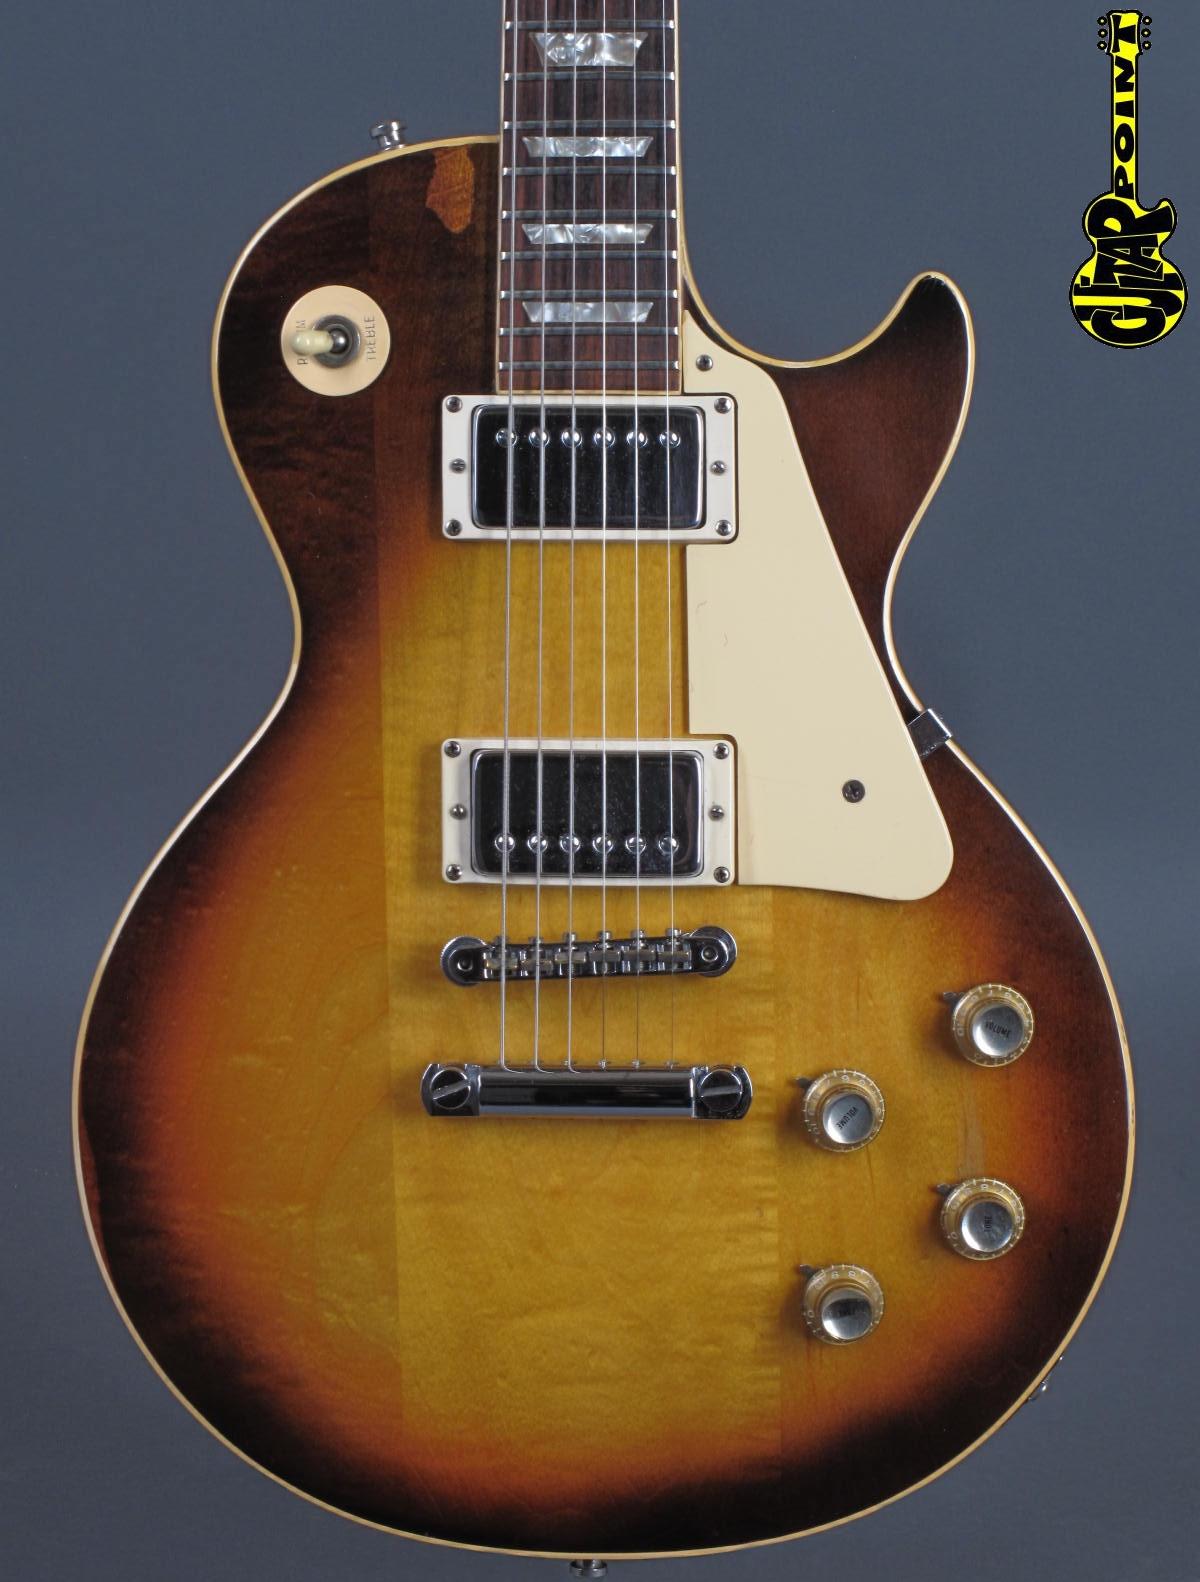 1974 Gibson Les Paul Standard - Tobacco Burst